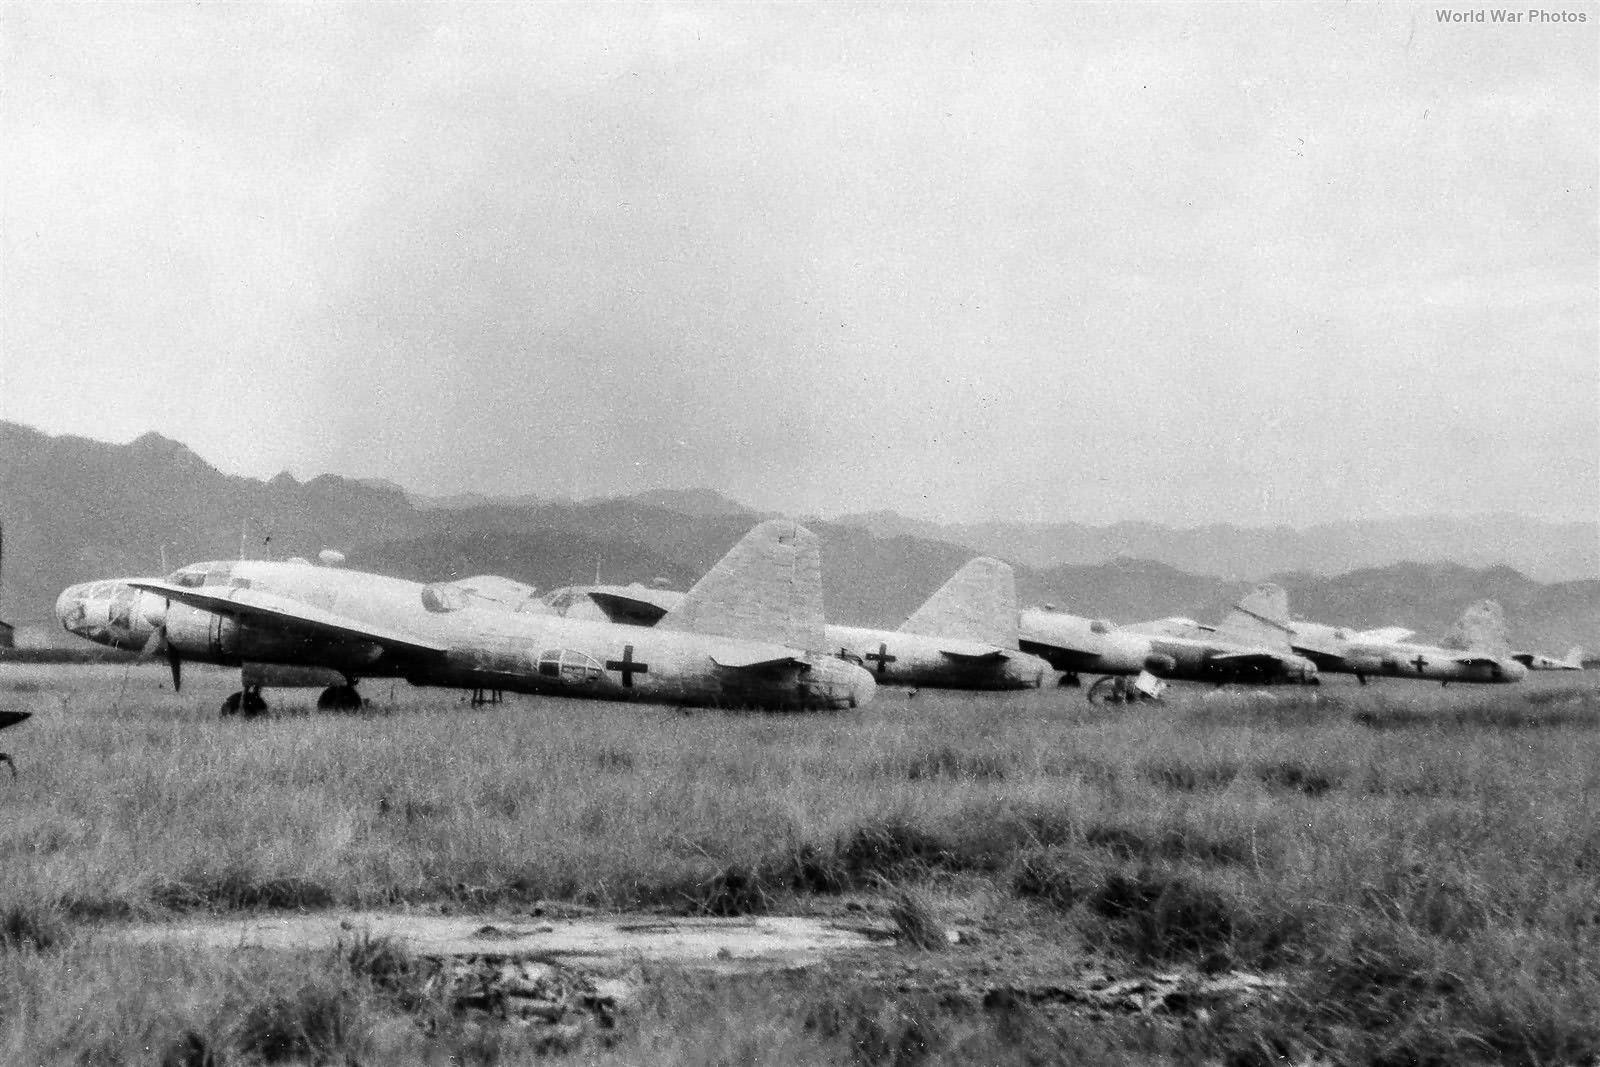 Ki-67 bombers on Formosa 5sep1945